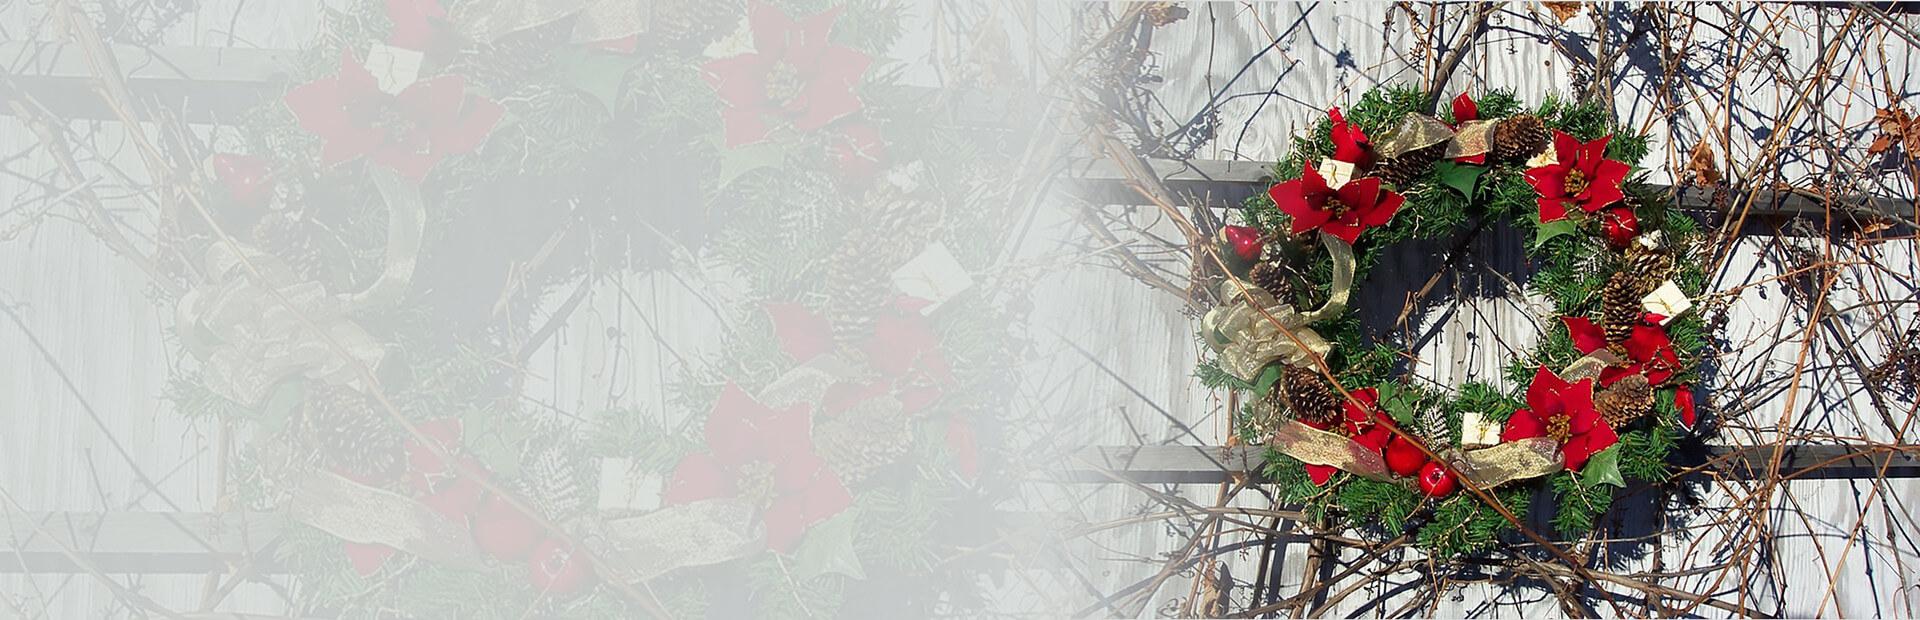 Christmas Wreath Garland Banner